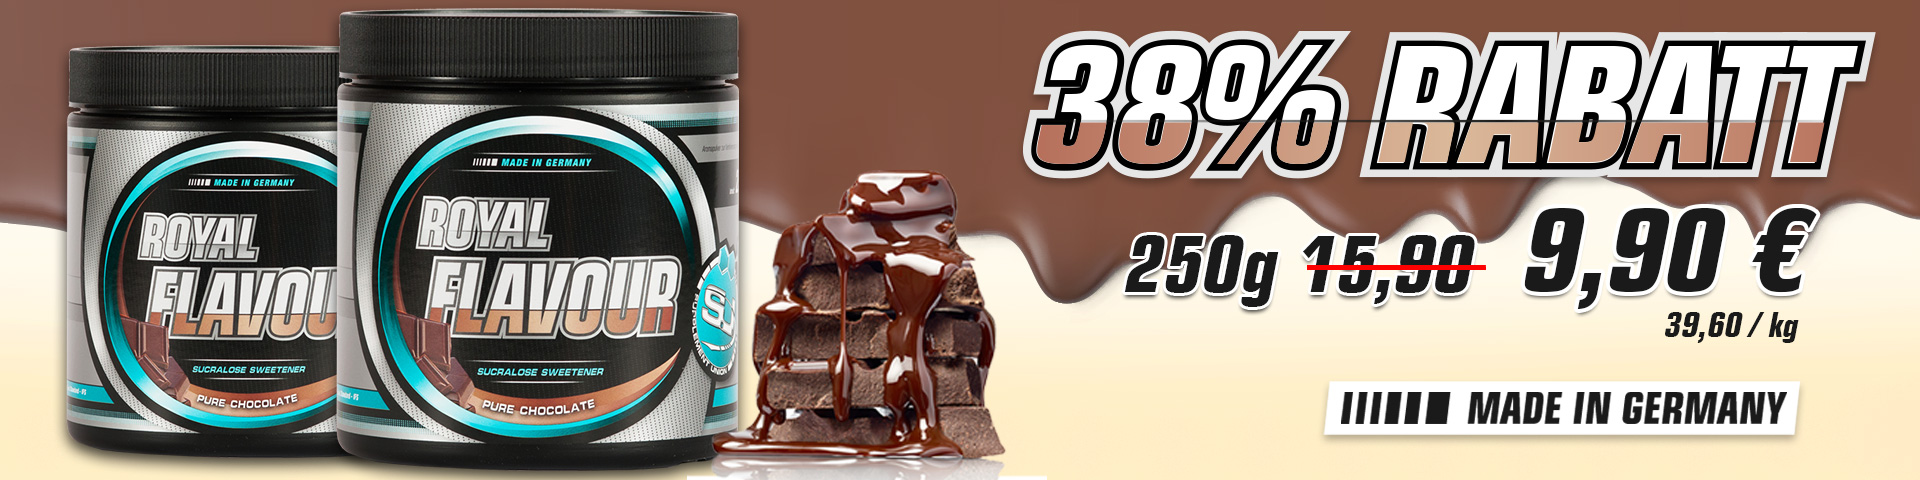 royal-flavour-pure-chocolate.jpg